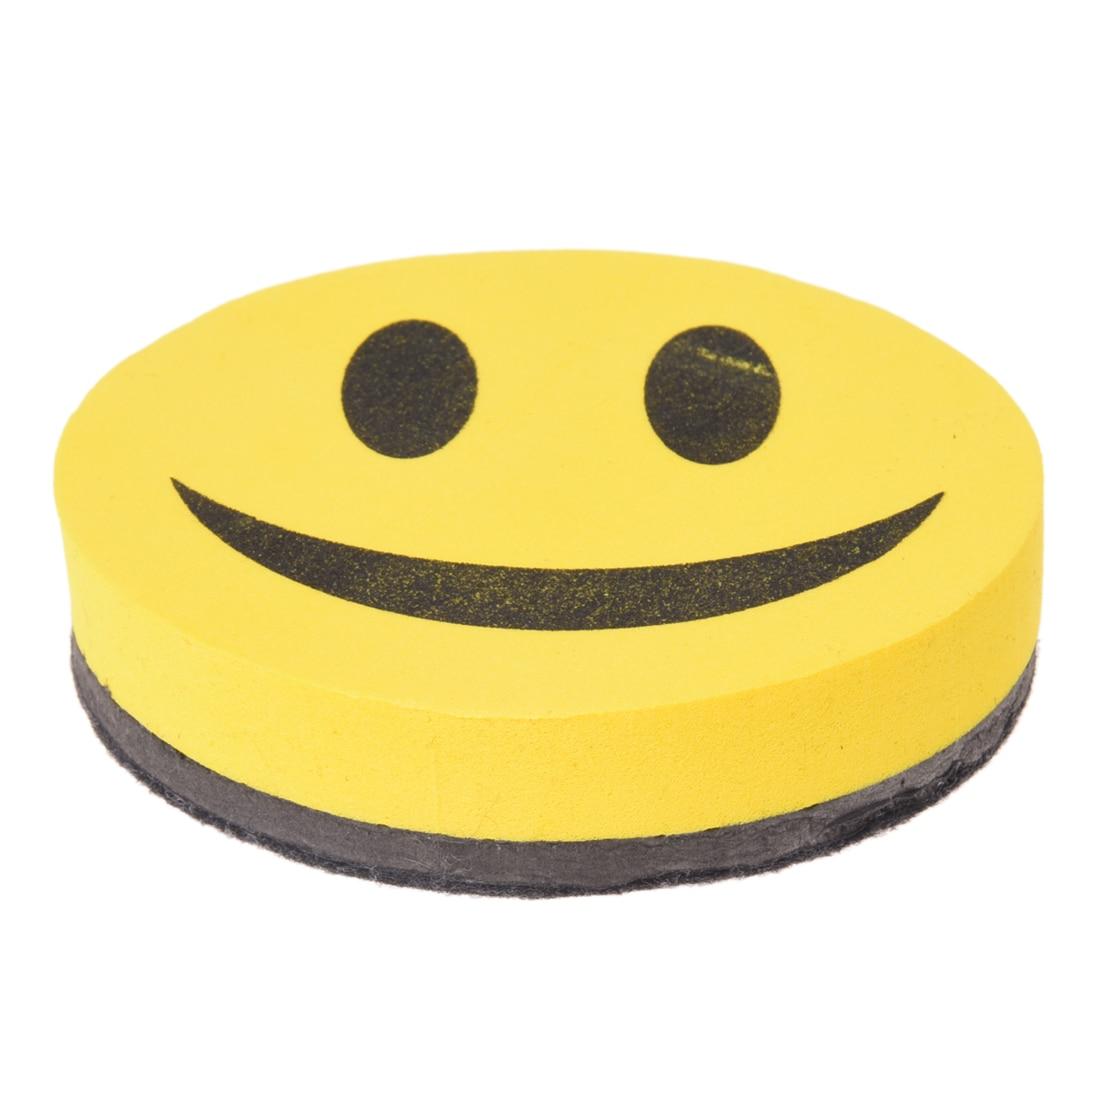 10pack (Magnetic White Board Blackboard Dry Wipe Dry Wipe Marker Cleaner Eraser School